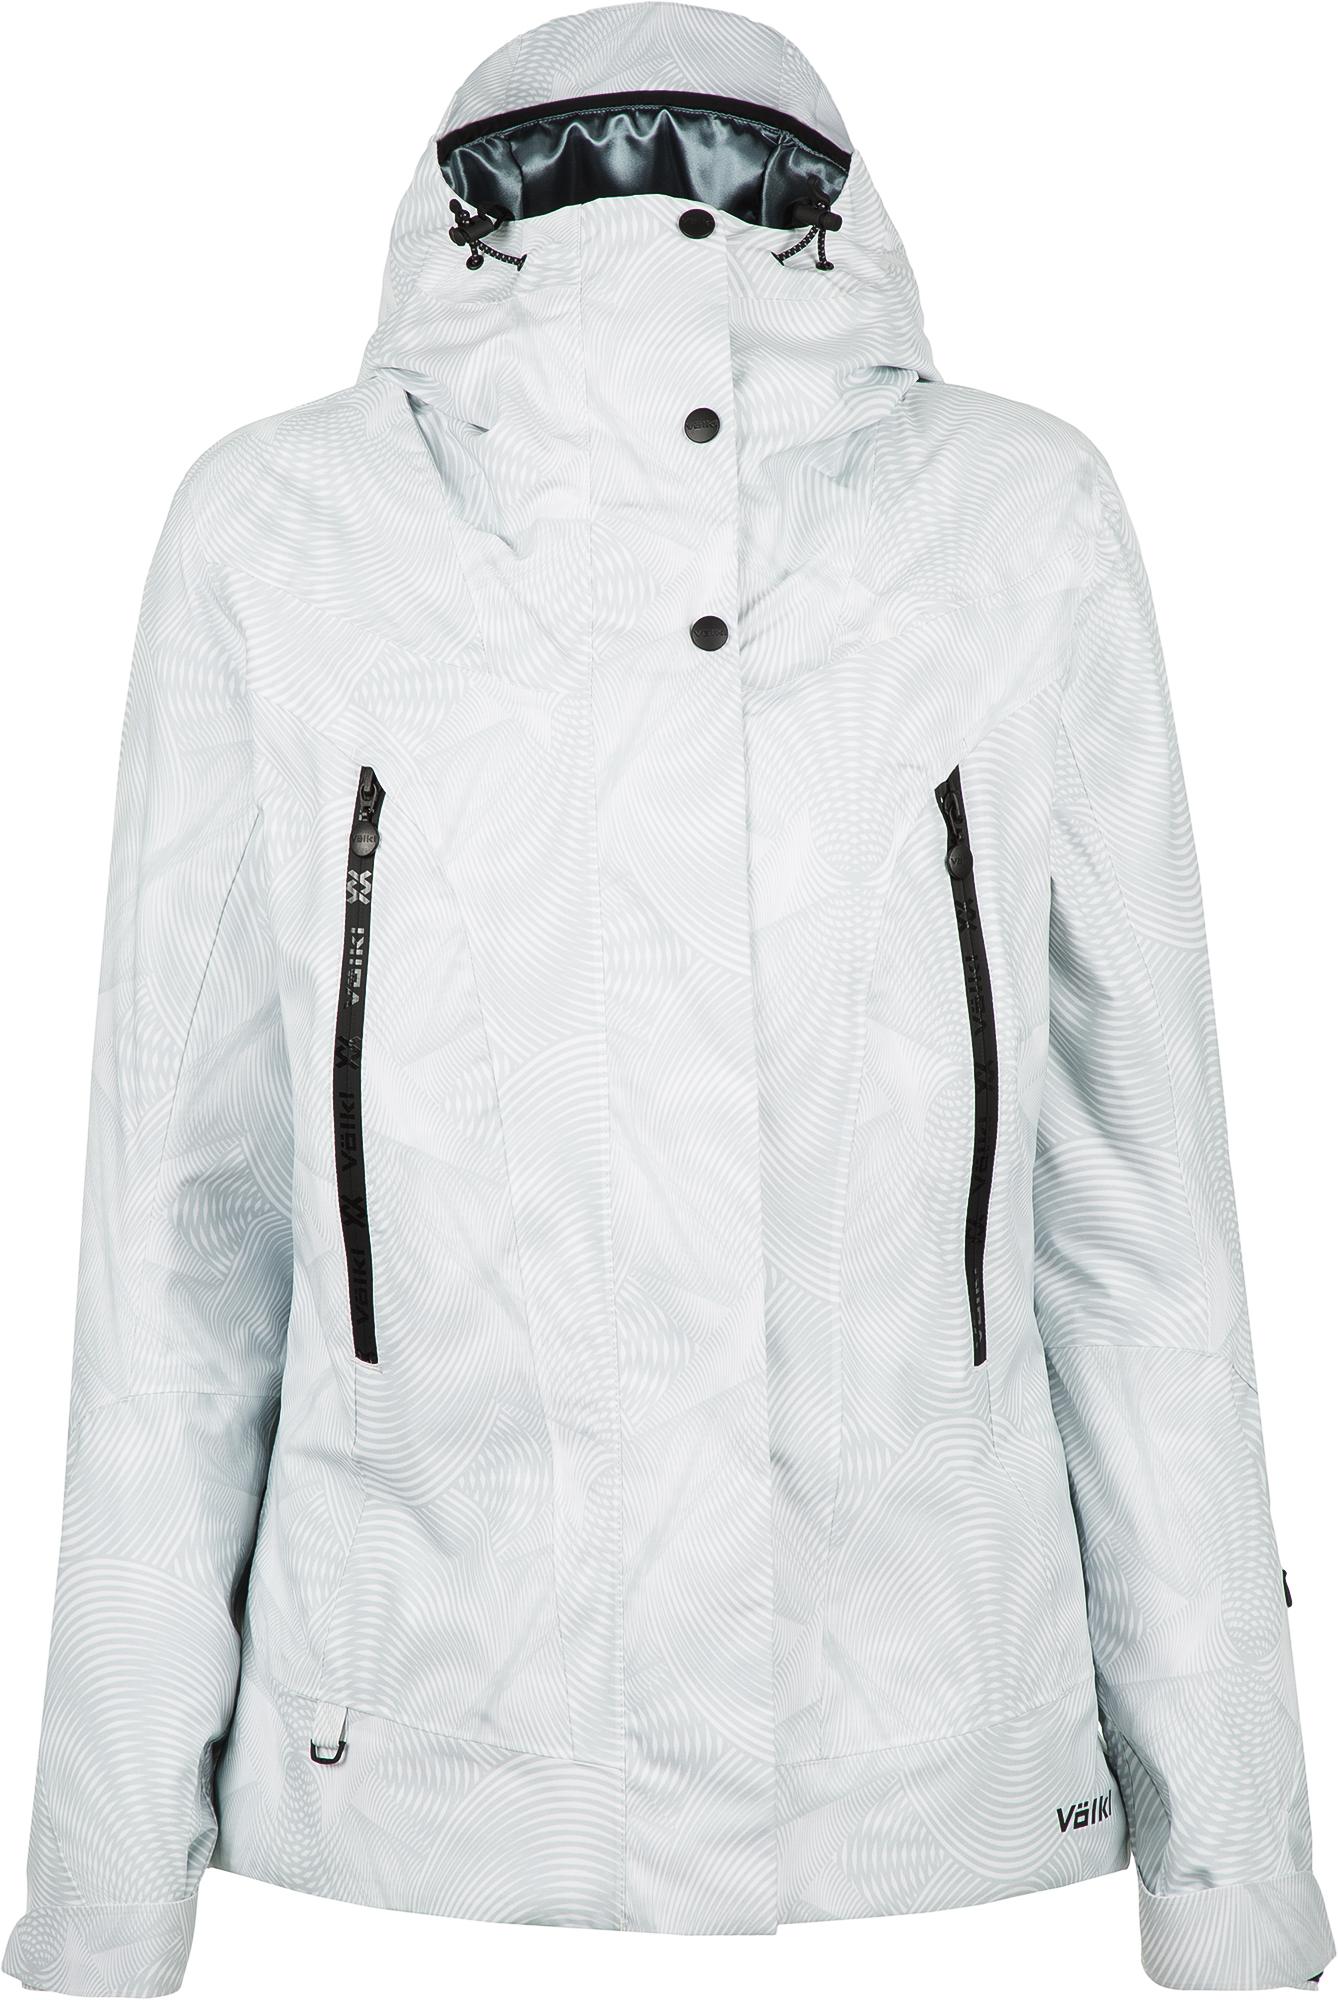 Volkl Куртка утепленная женская Volkl, размер 50 volkl volkl flair sc vmotion 11 alu gw lady 18 19 размер 158